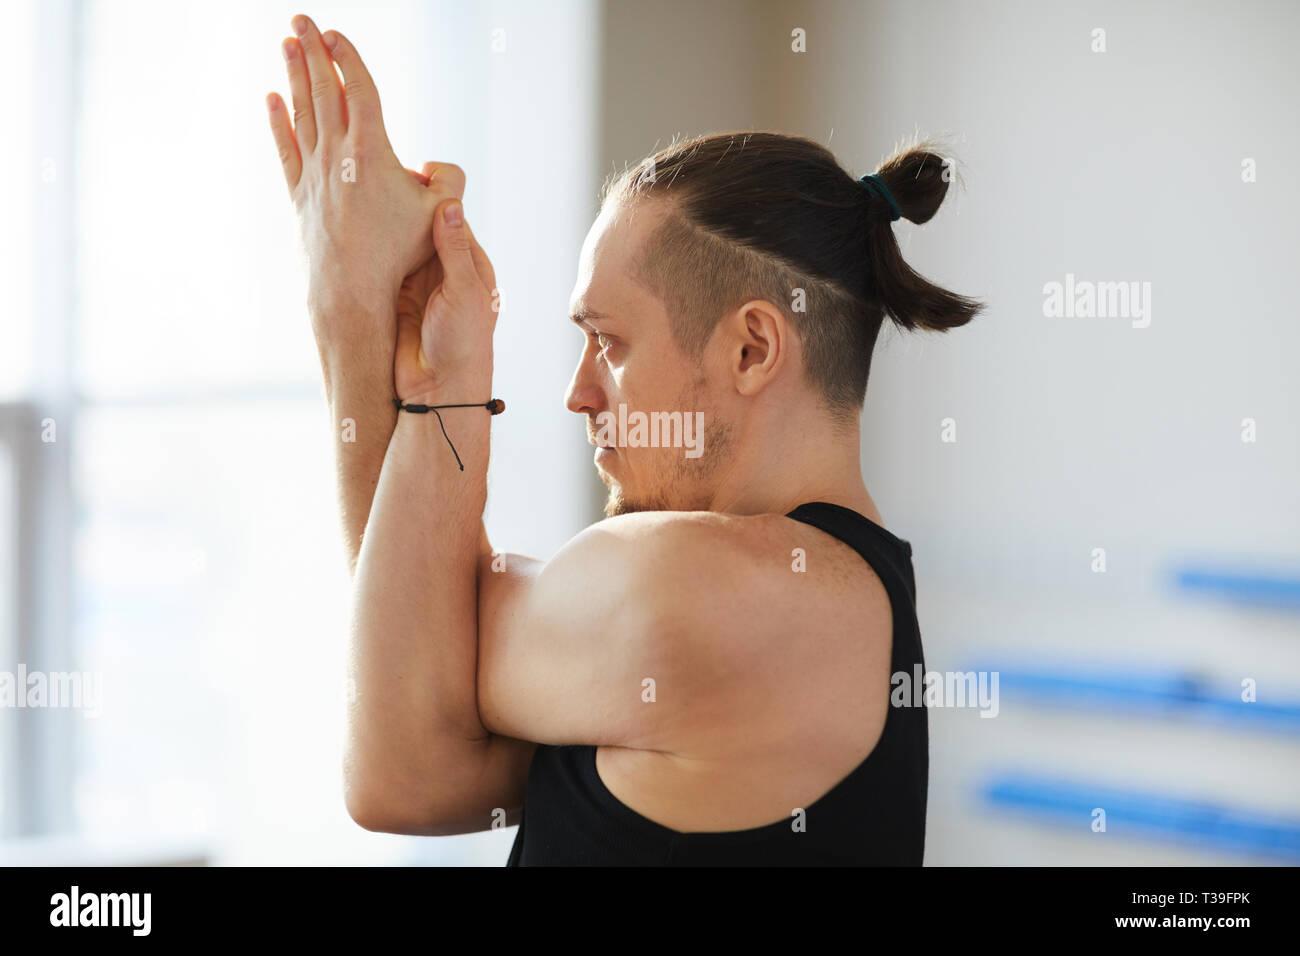 Yoga pose including eagle arms - Stock Image